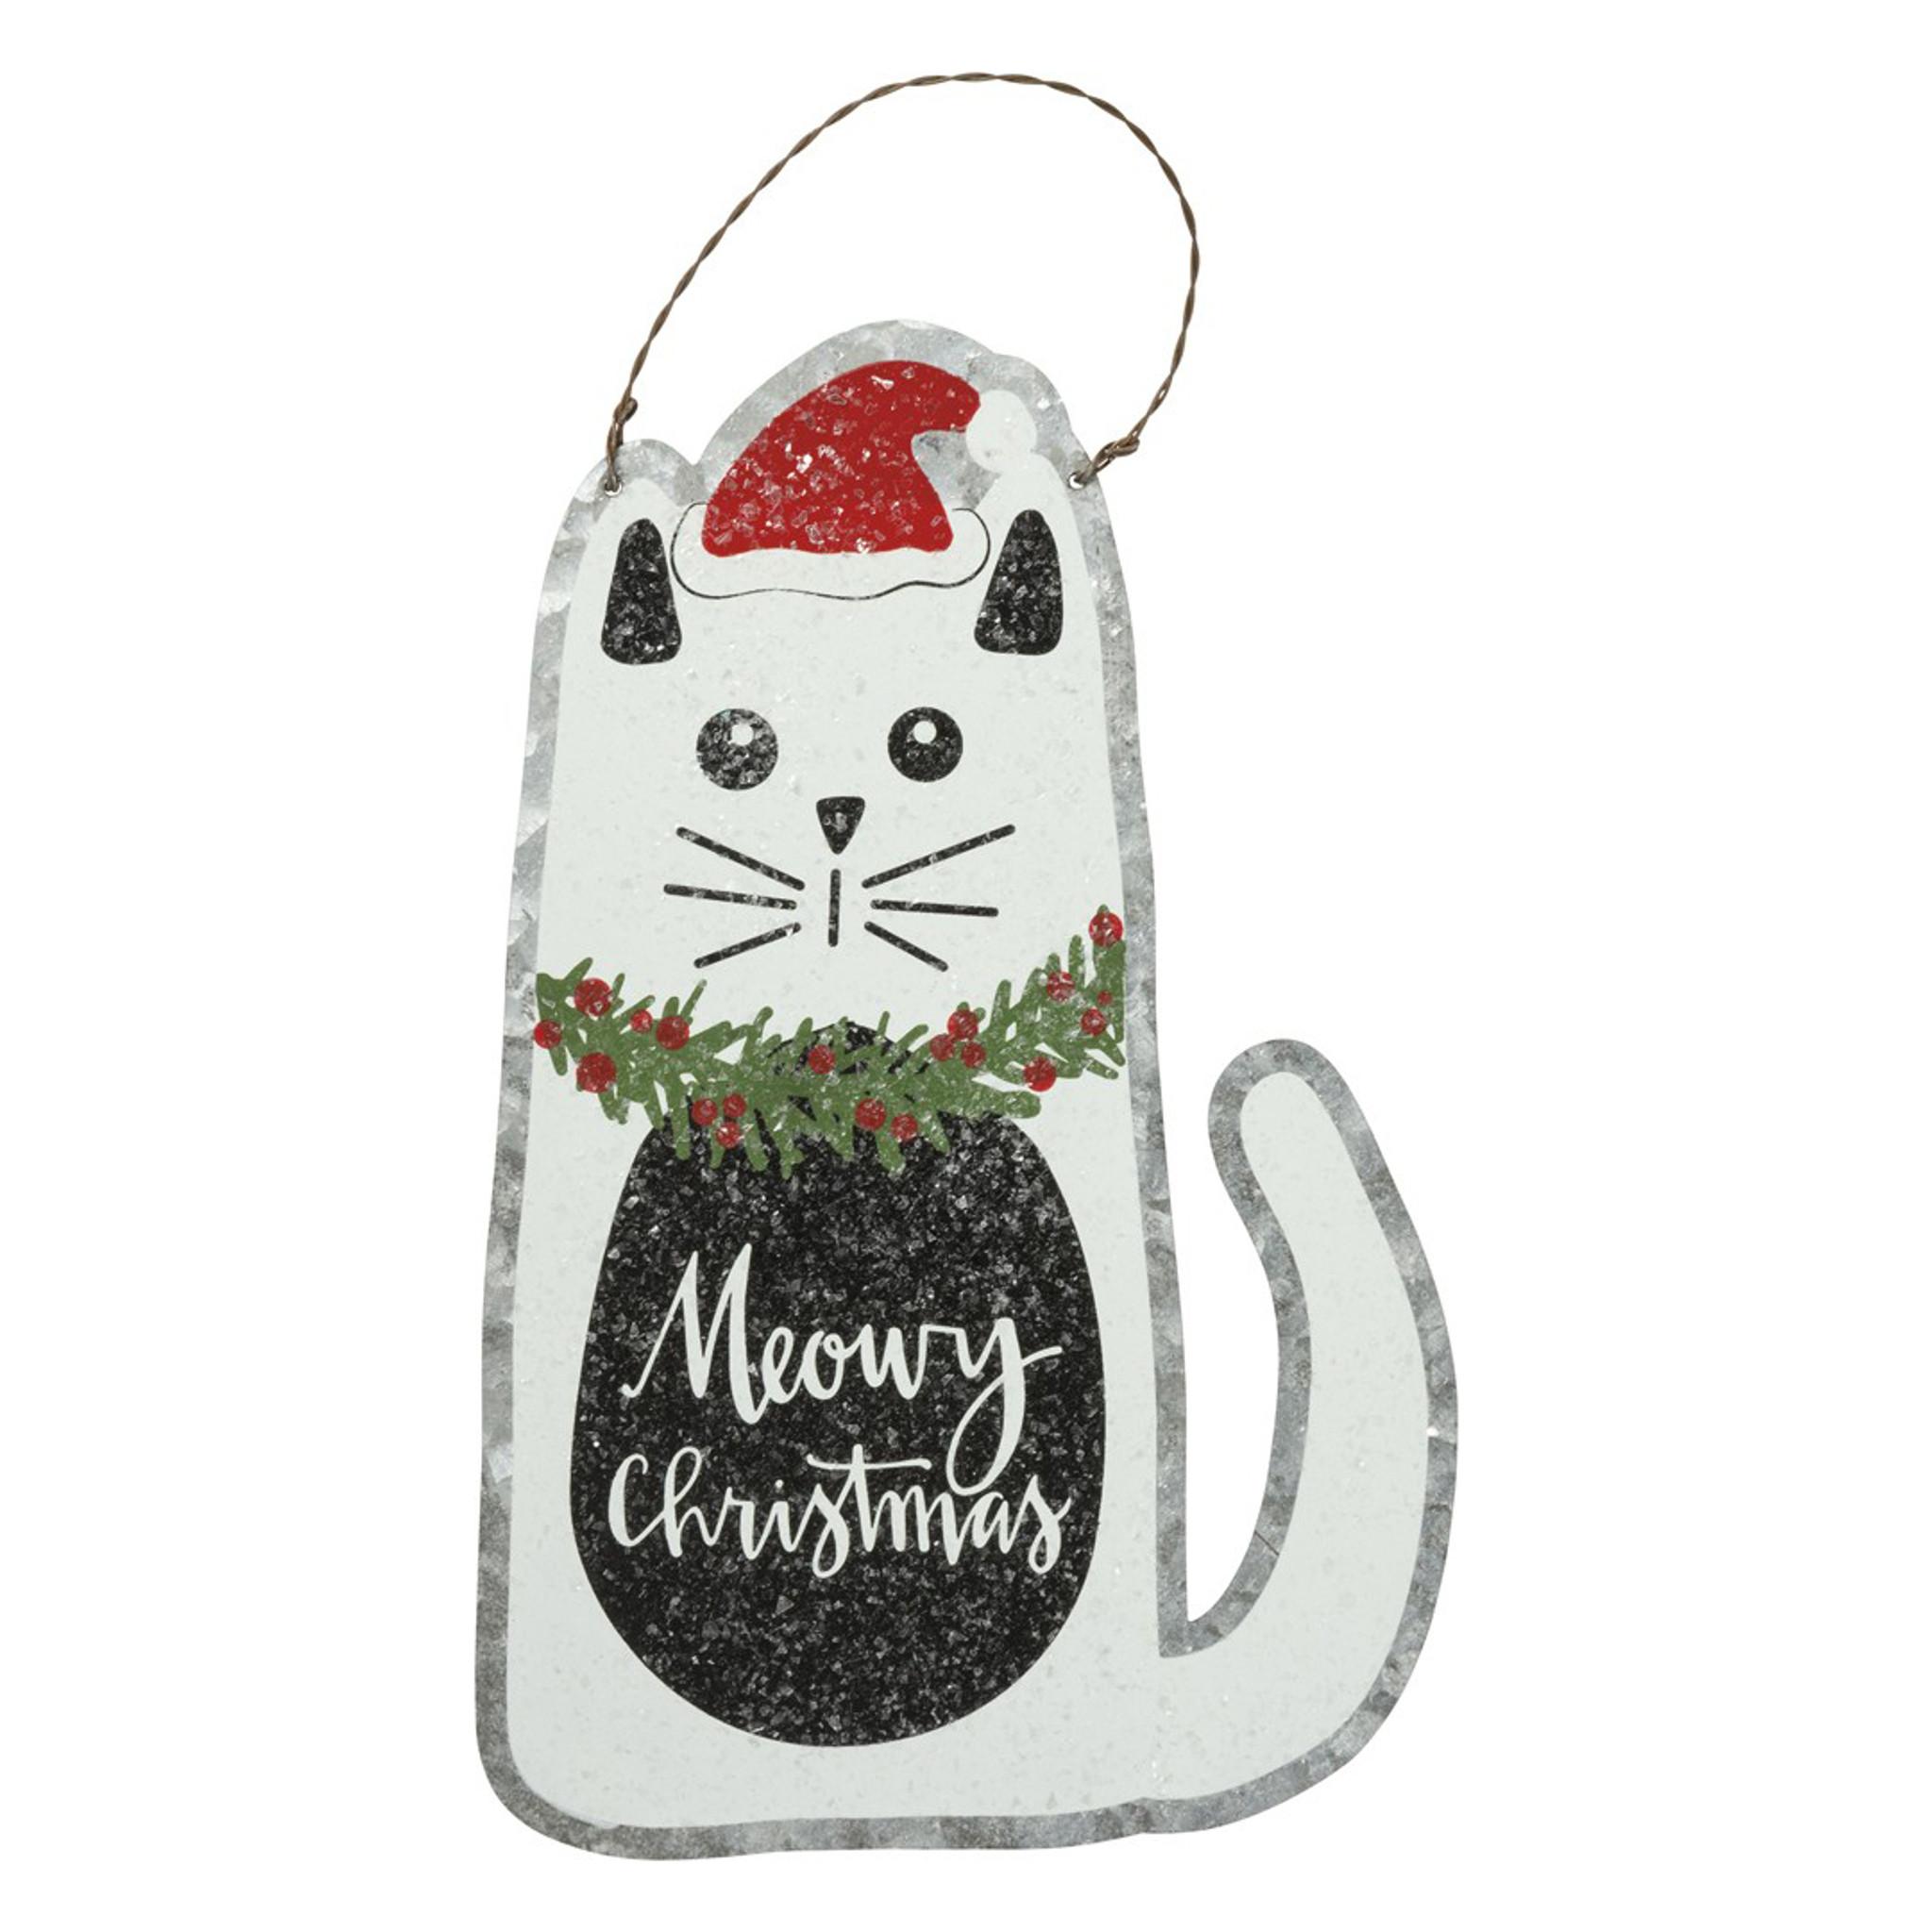 Meowy Christmas.Meowy Christmas Cat Tin Hanging Sign